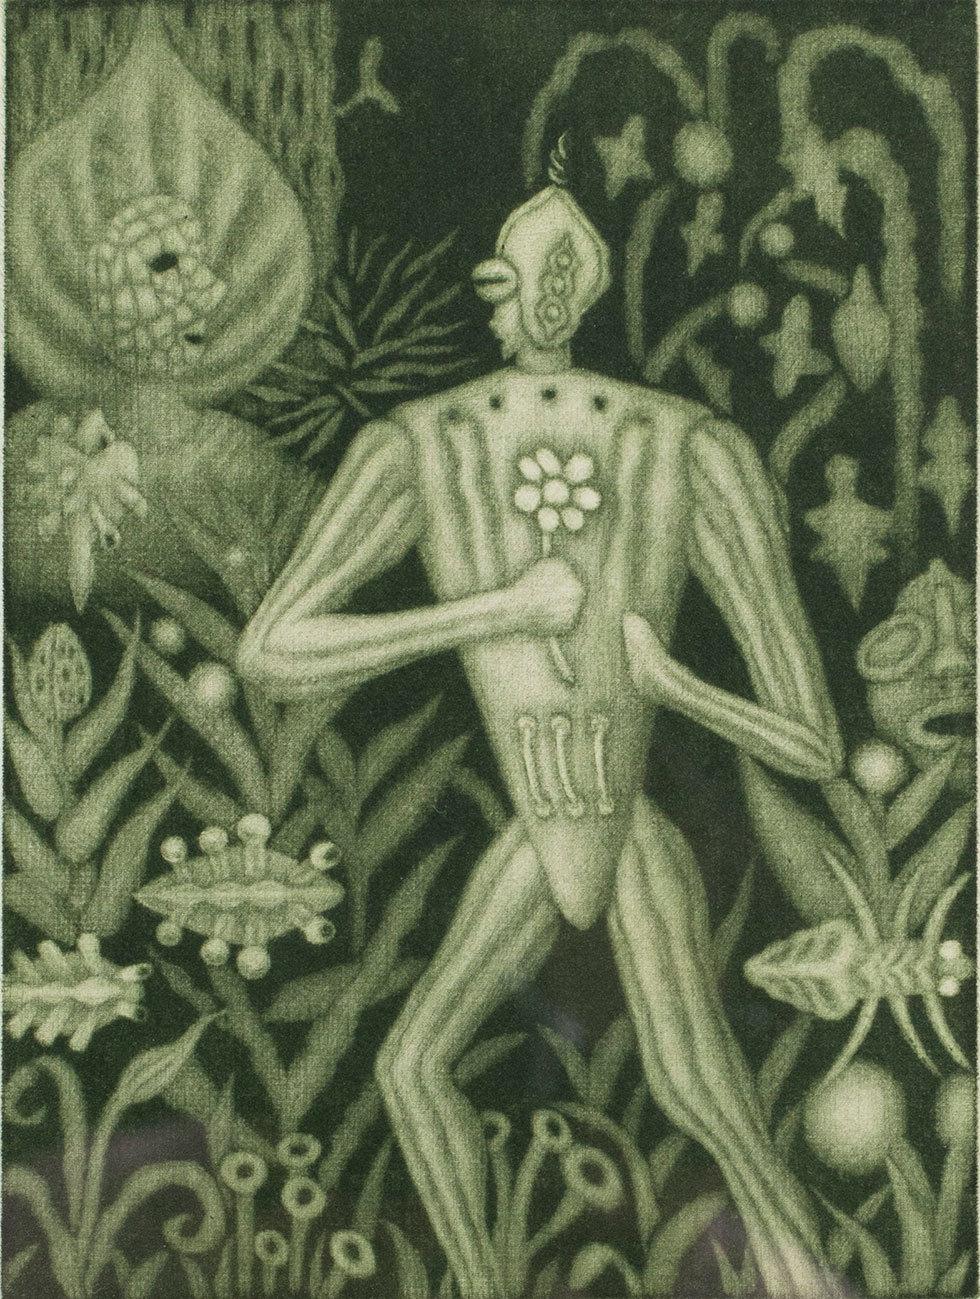 佐竹広弥「Botanical world」